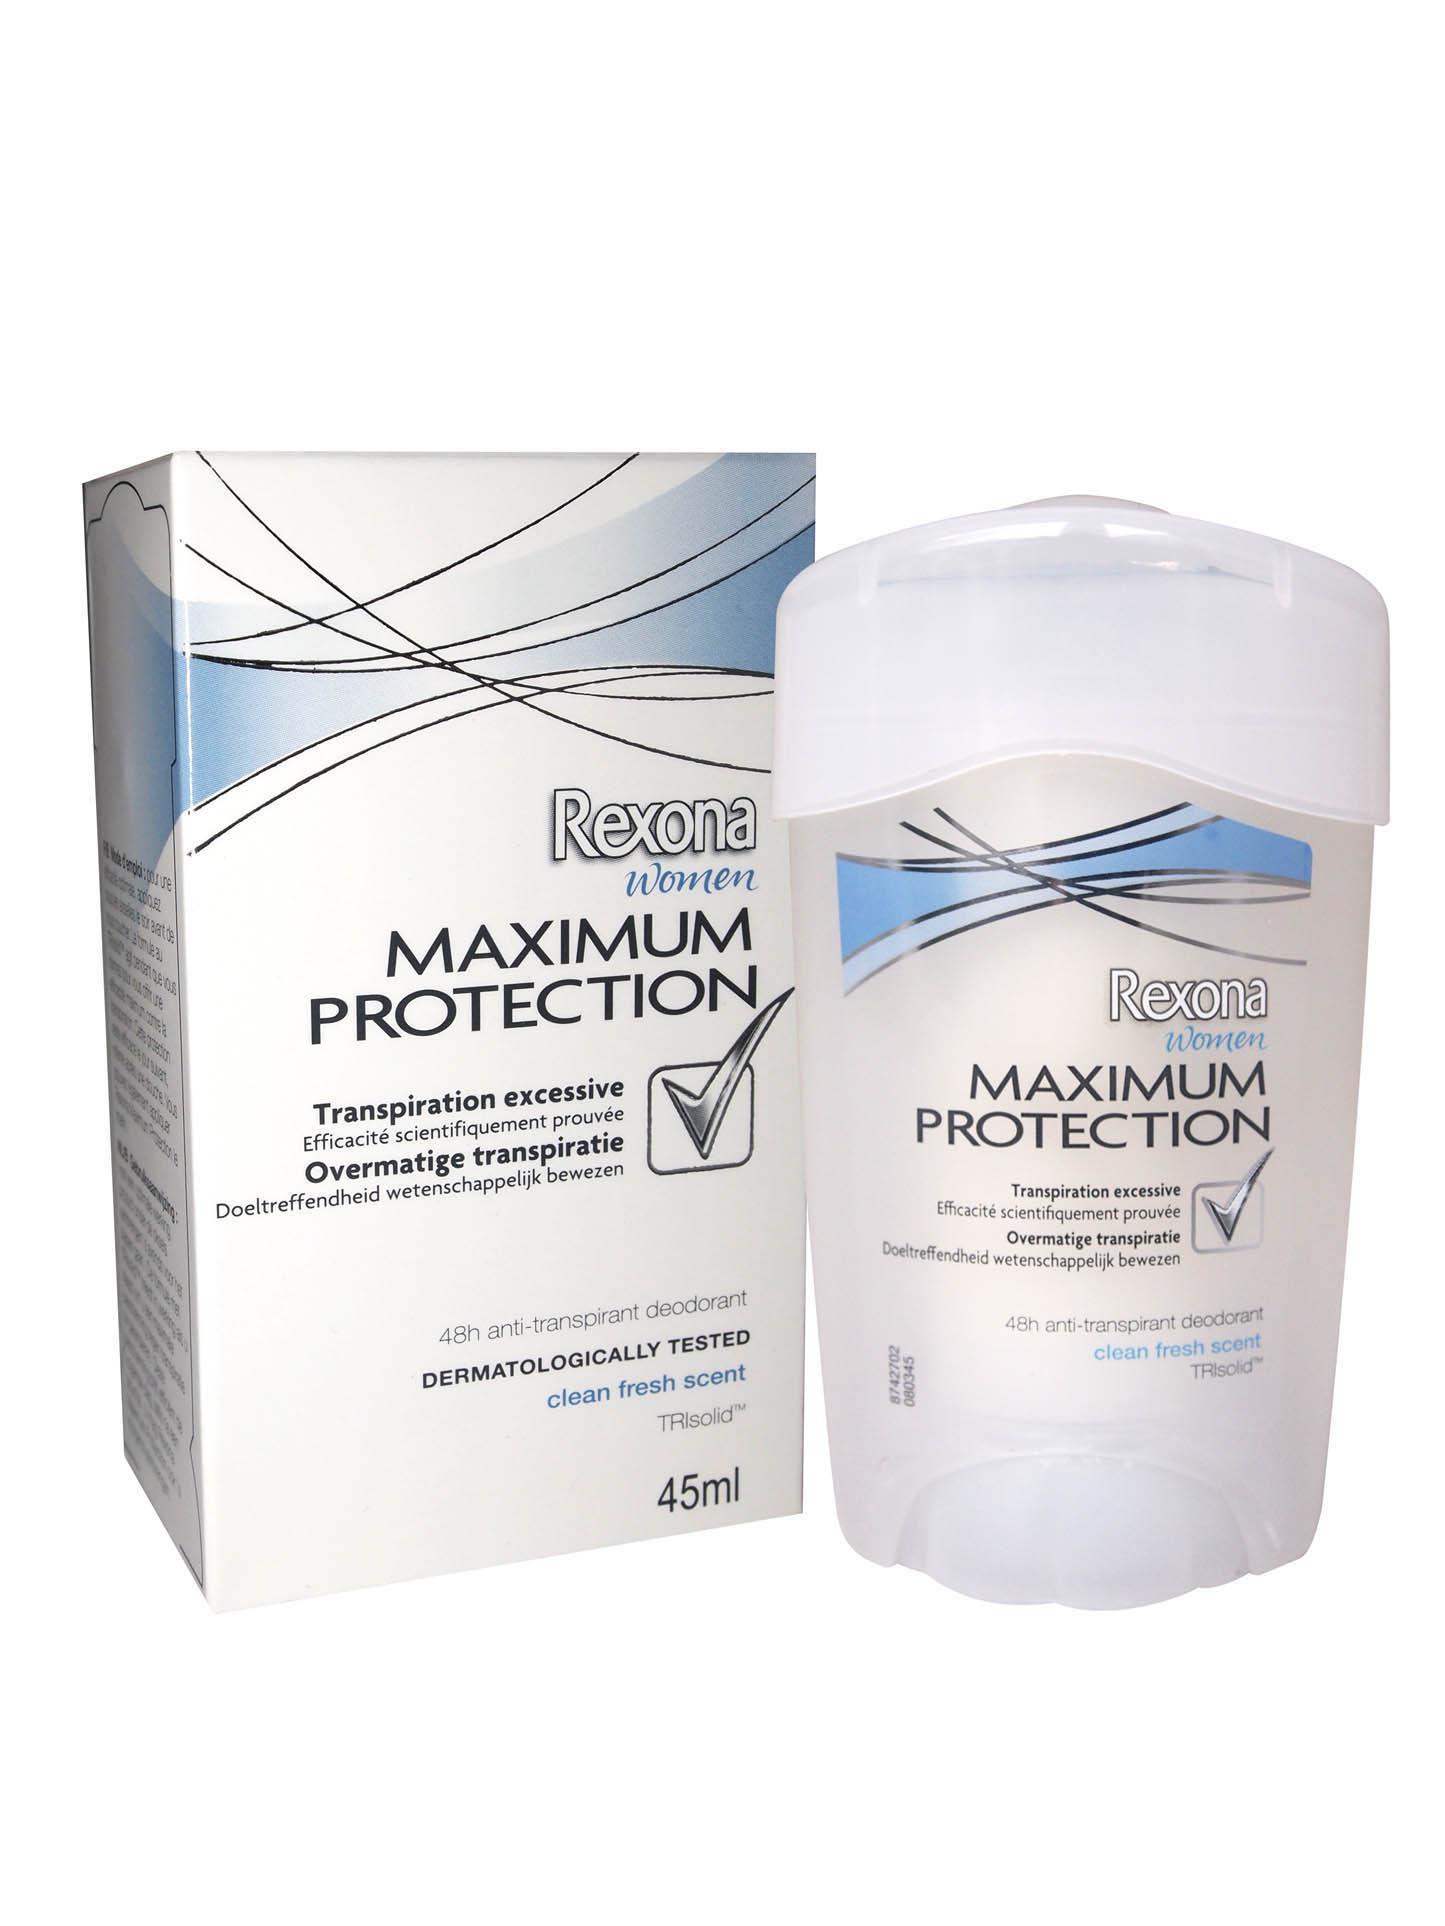 Rexona-Maxpro-Clean-Fresh-Scent.jpg